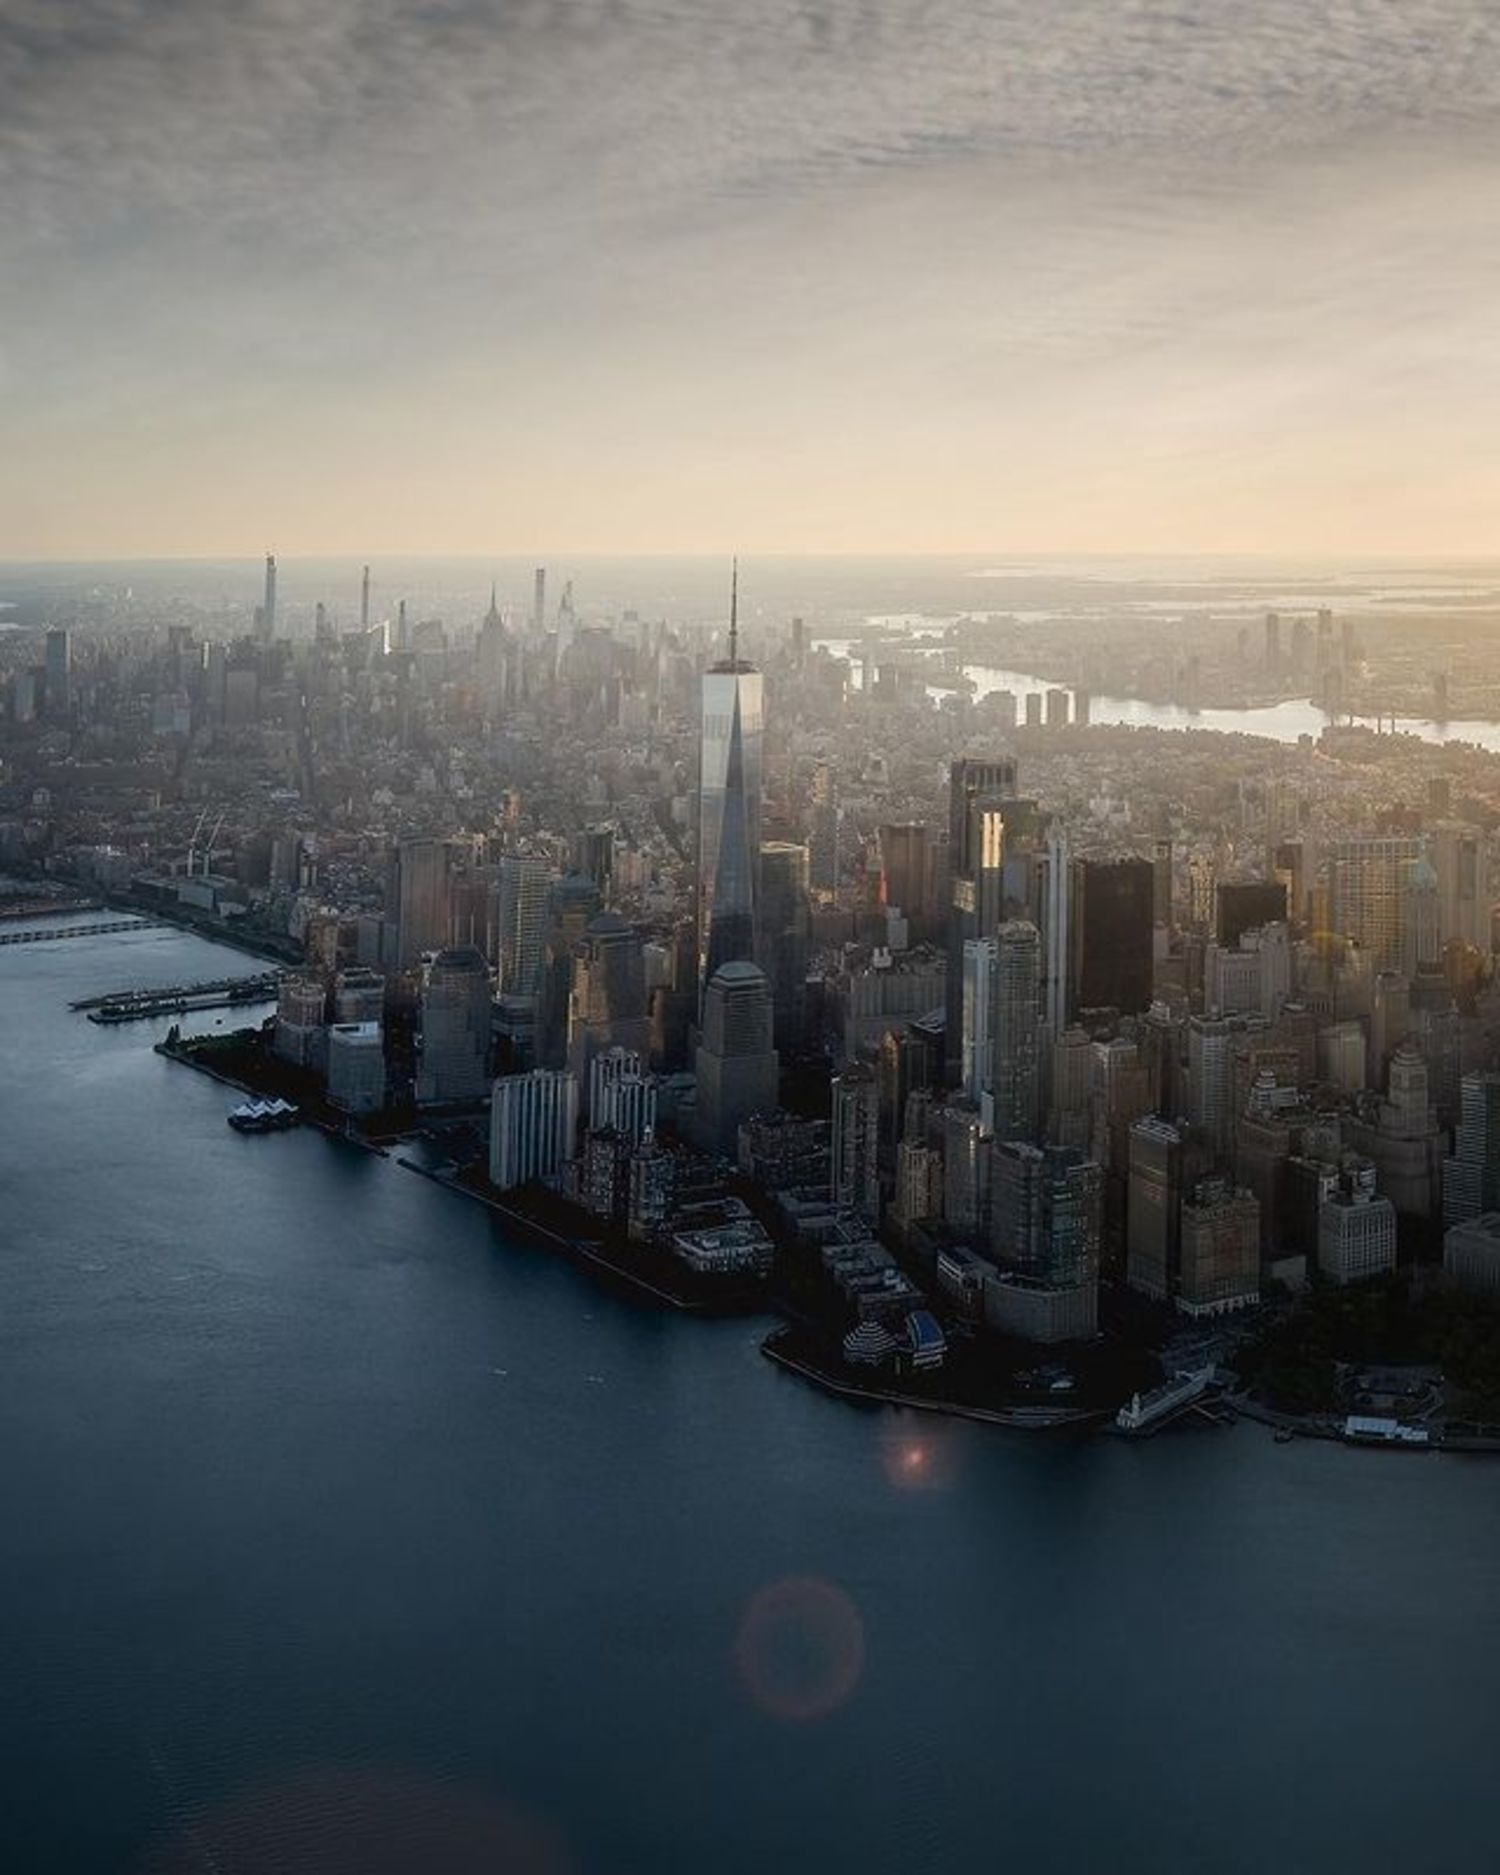 Sunrise over Lower Manhattan, New York